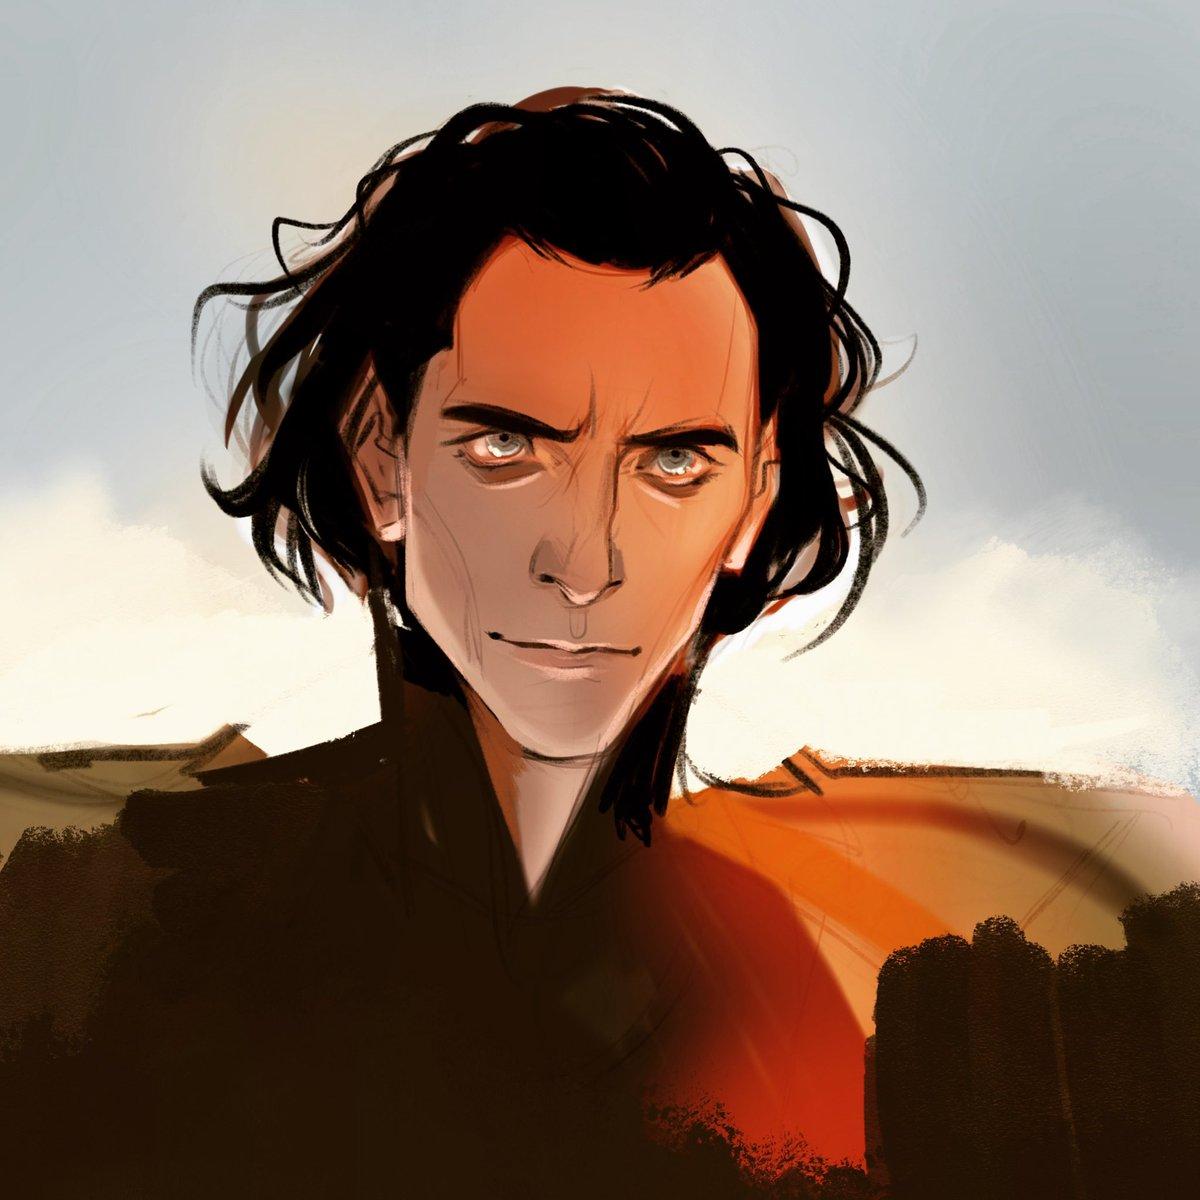 RT @kallielef: …burdened with glorious purpose…#Loki https://t.co/Ed5JvPPqm4